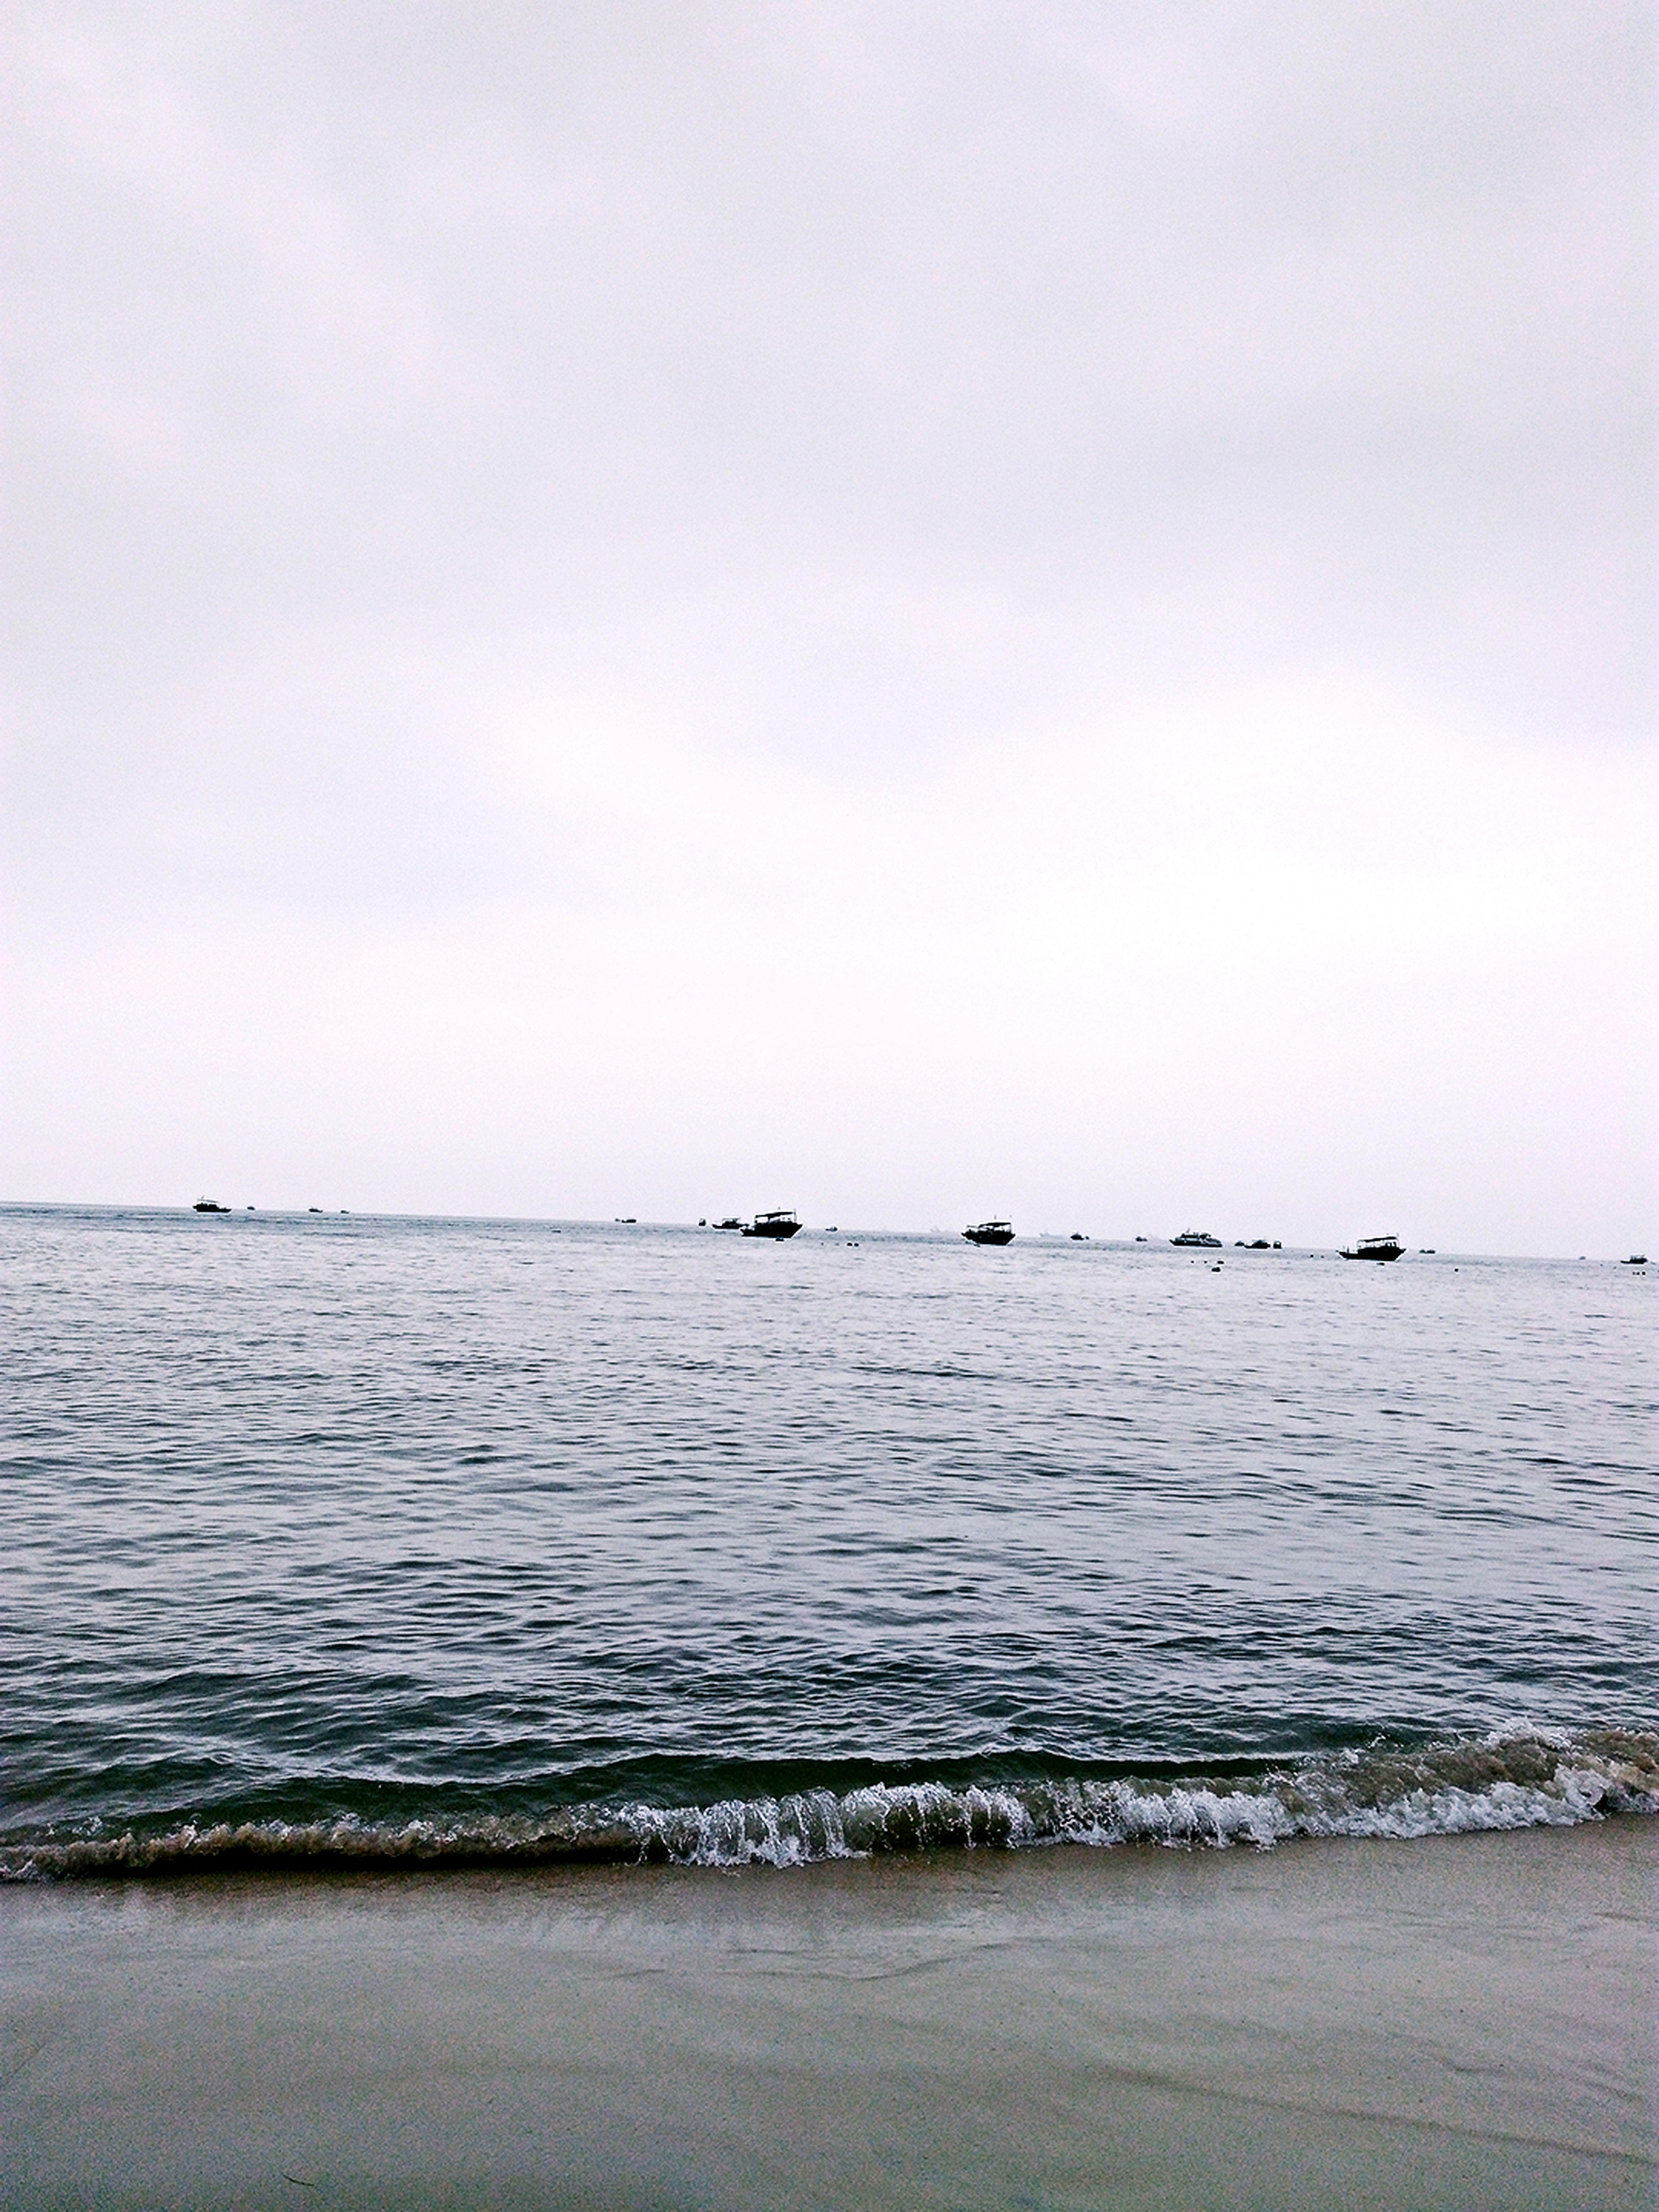 Guangdong 巽寮湾 Guangdong China Guangdong Style Sea Sea And Sky Sea_collection Sea View 沙滩 海大スキ 海 海岸 宽广 Sea Life EyeEmNewHere